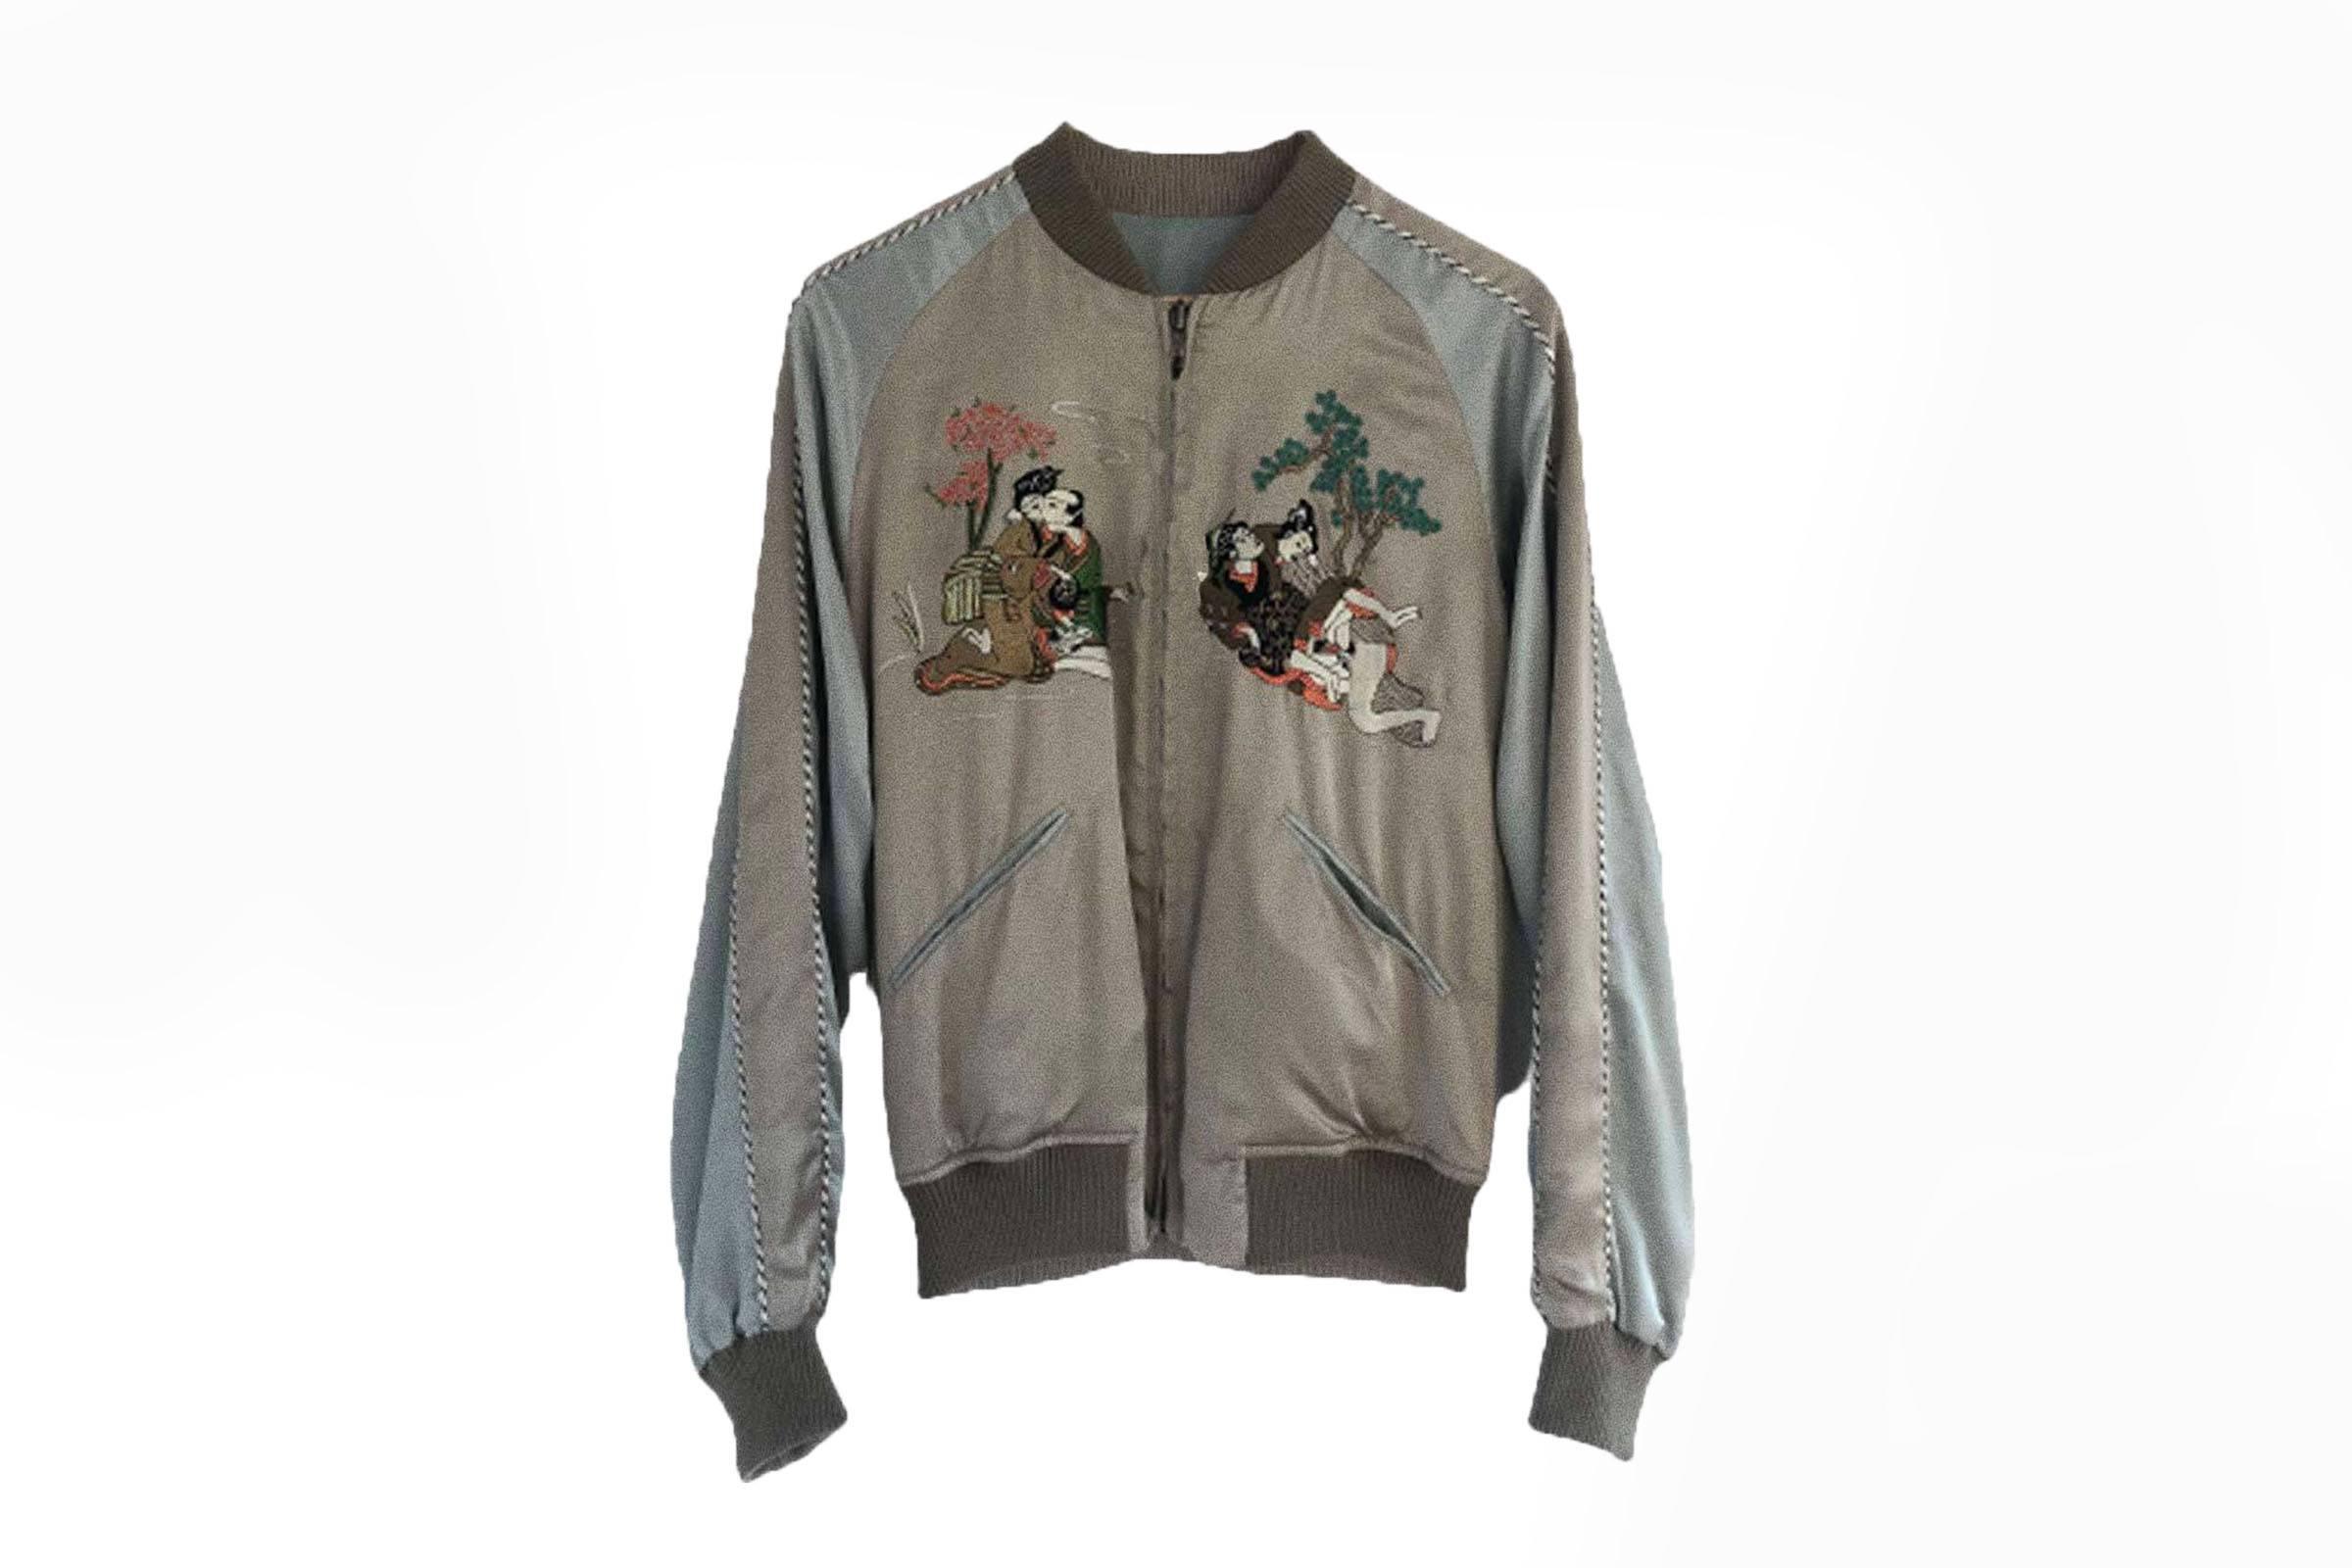 Gucci Spring/Summer 2003 Shunga Kama Sutra Souvenir Jacket